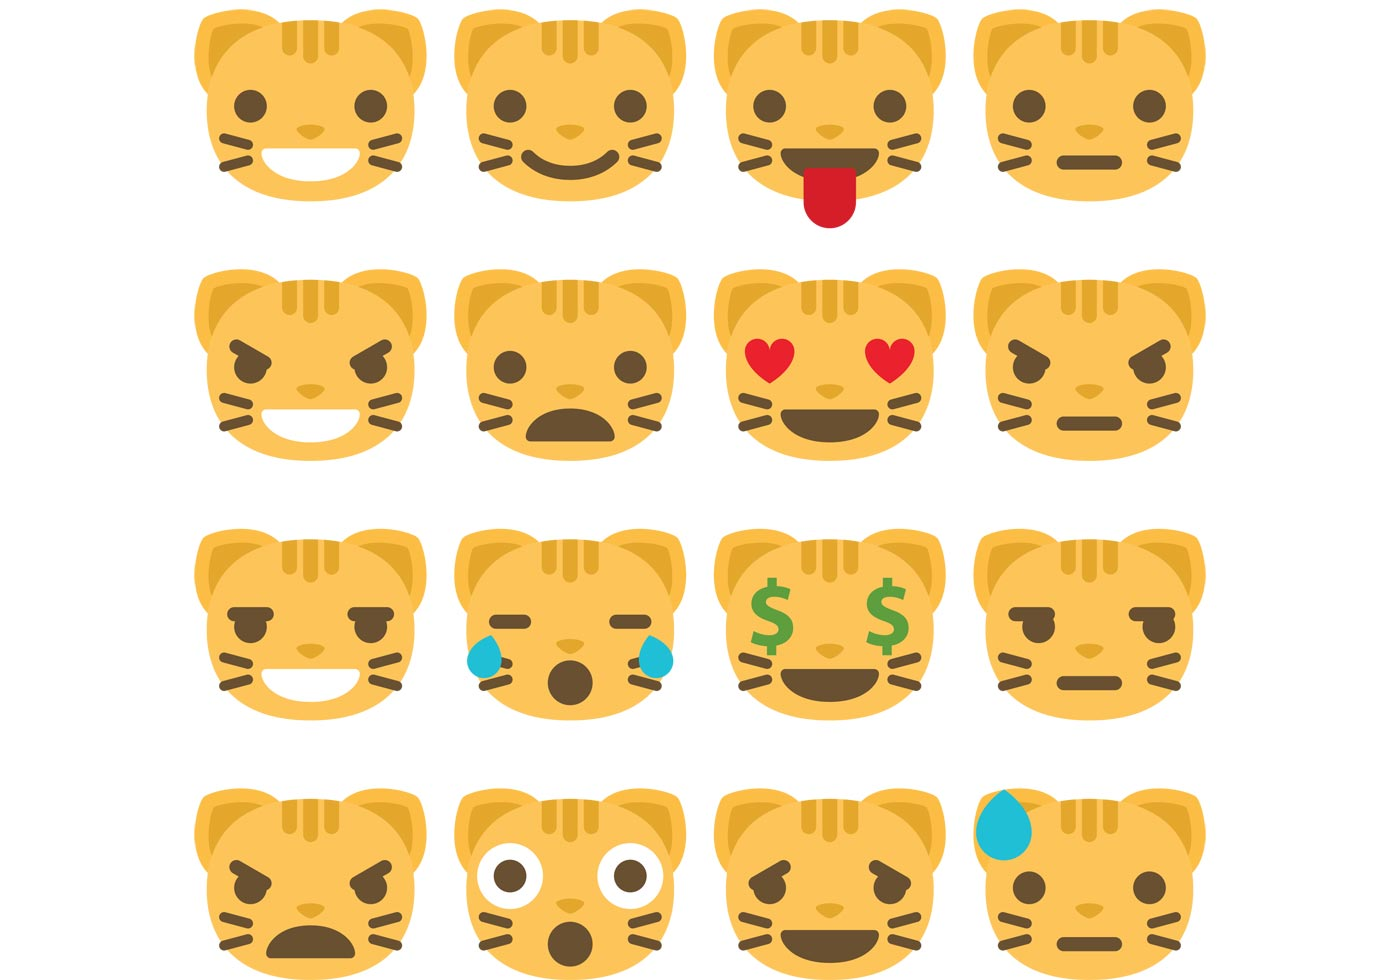 Cat Emoticon Vectors - Download Free Vector Art, Stock Graphics ...